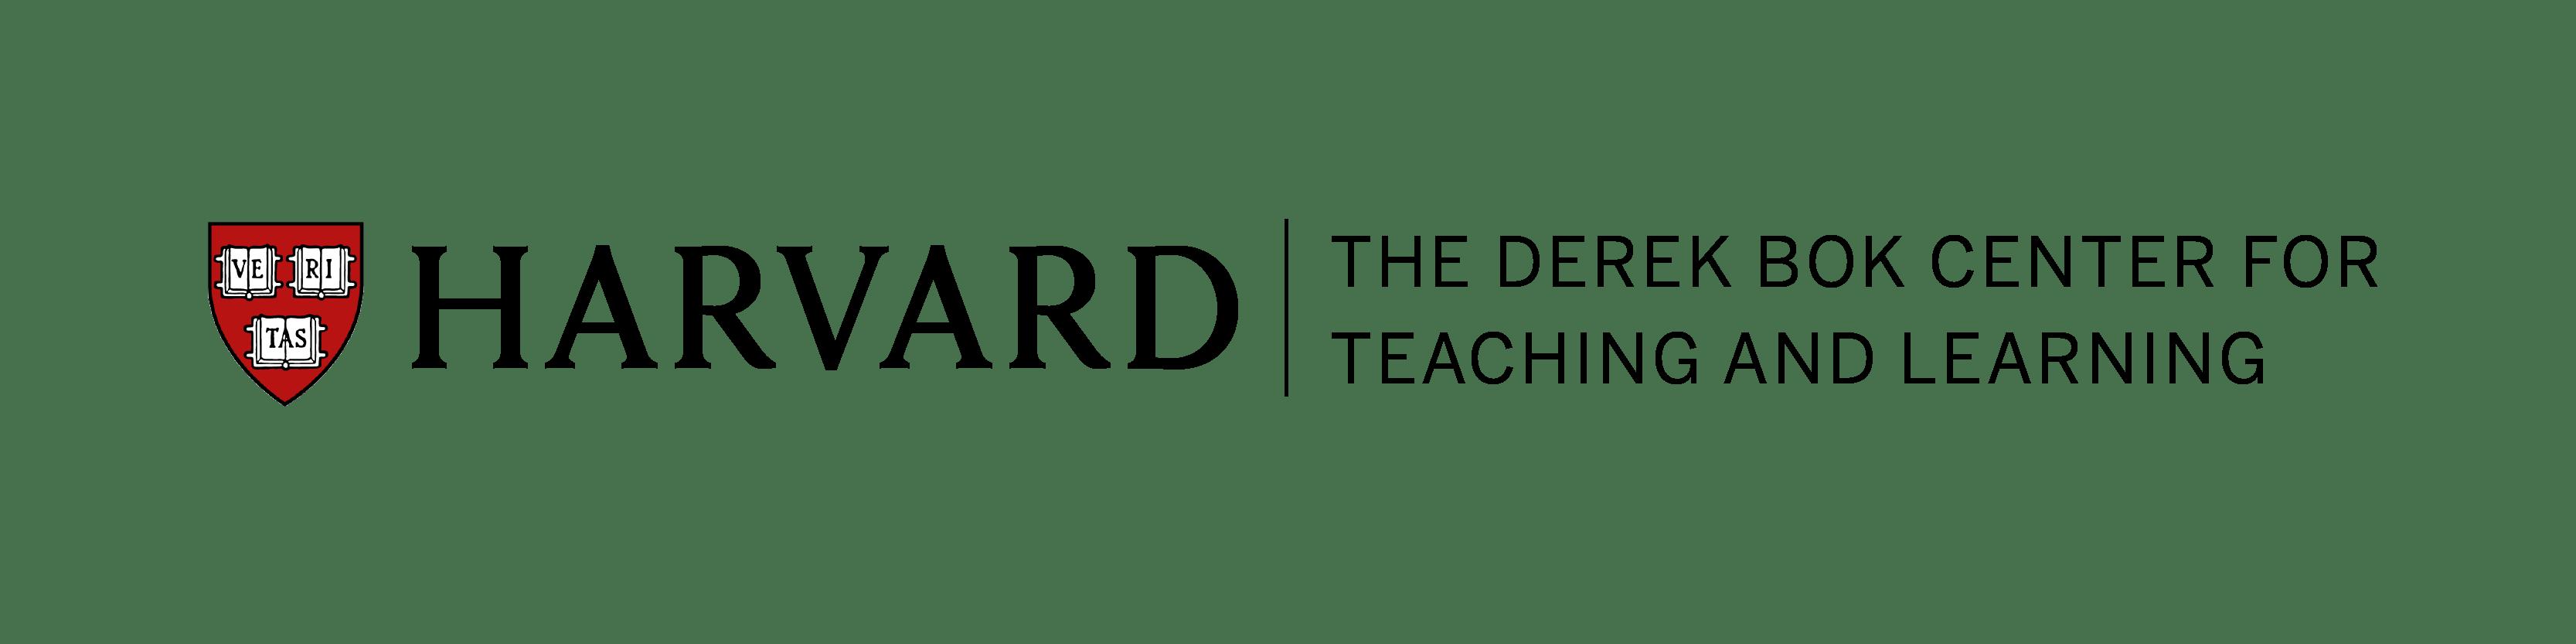 023 Bok Logo Harvard Left Shield Black Original 1 Why Do You Want To Teacher Essay Impressive Be A Pdf Would Become Full